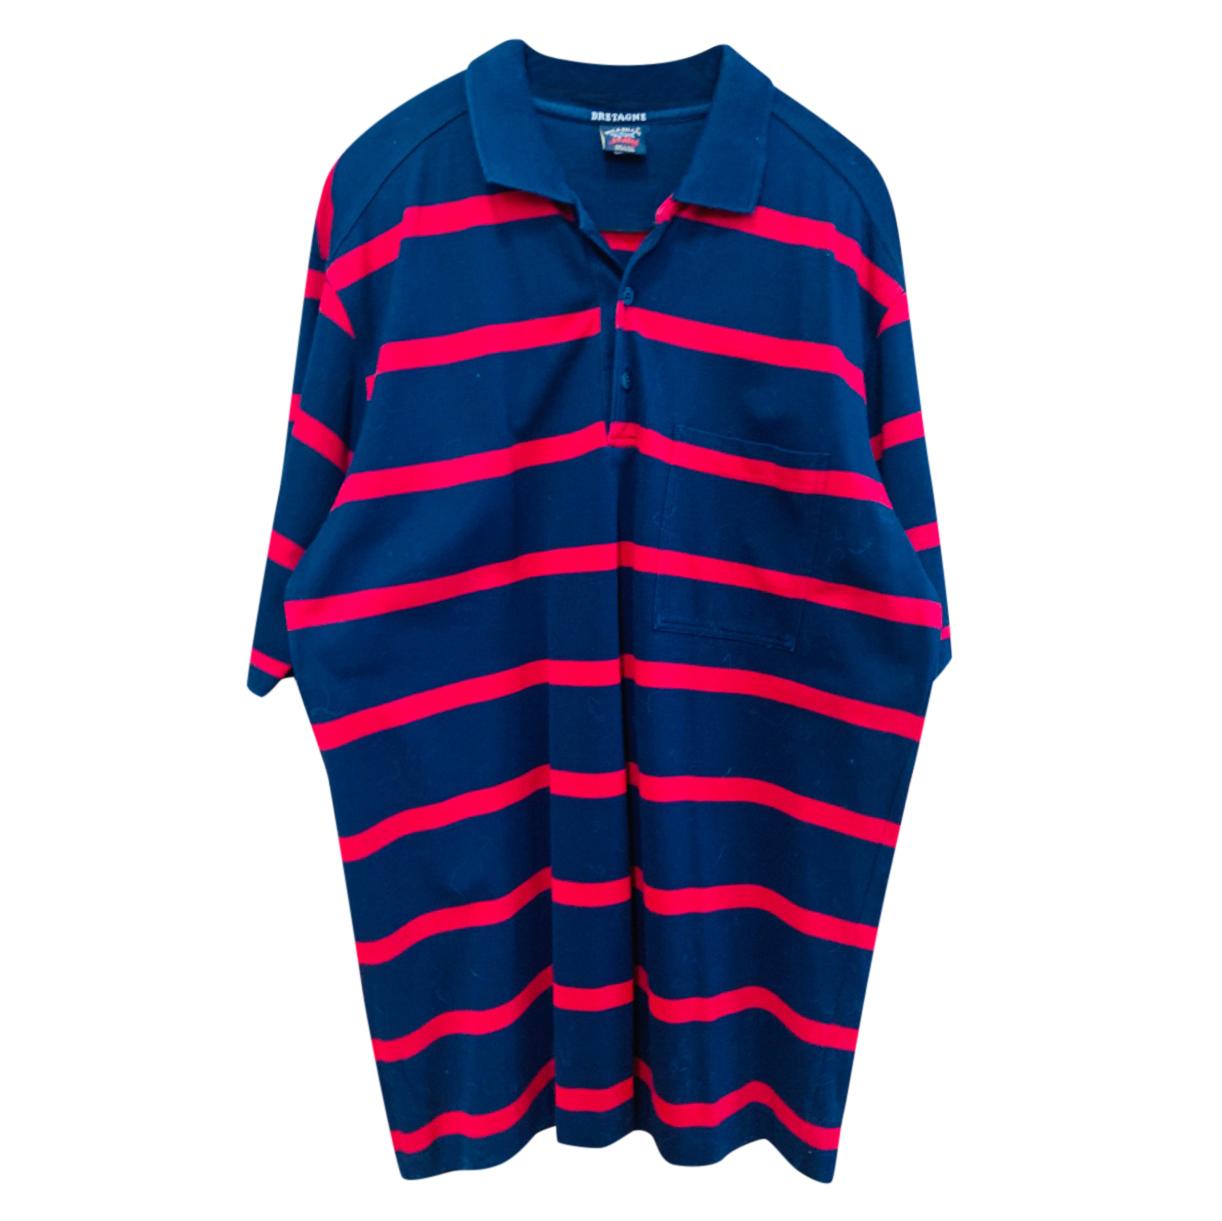 Paul & Shark mens striped polo shirt